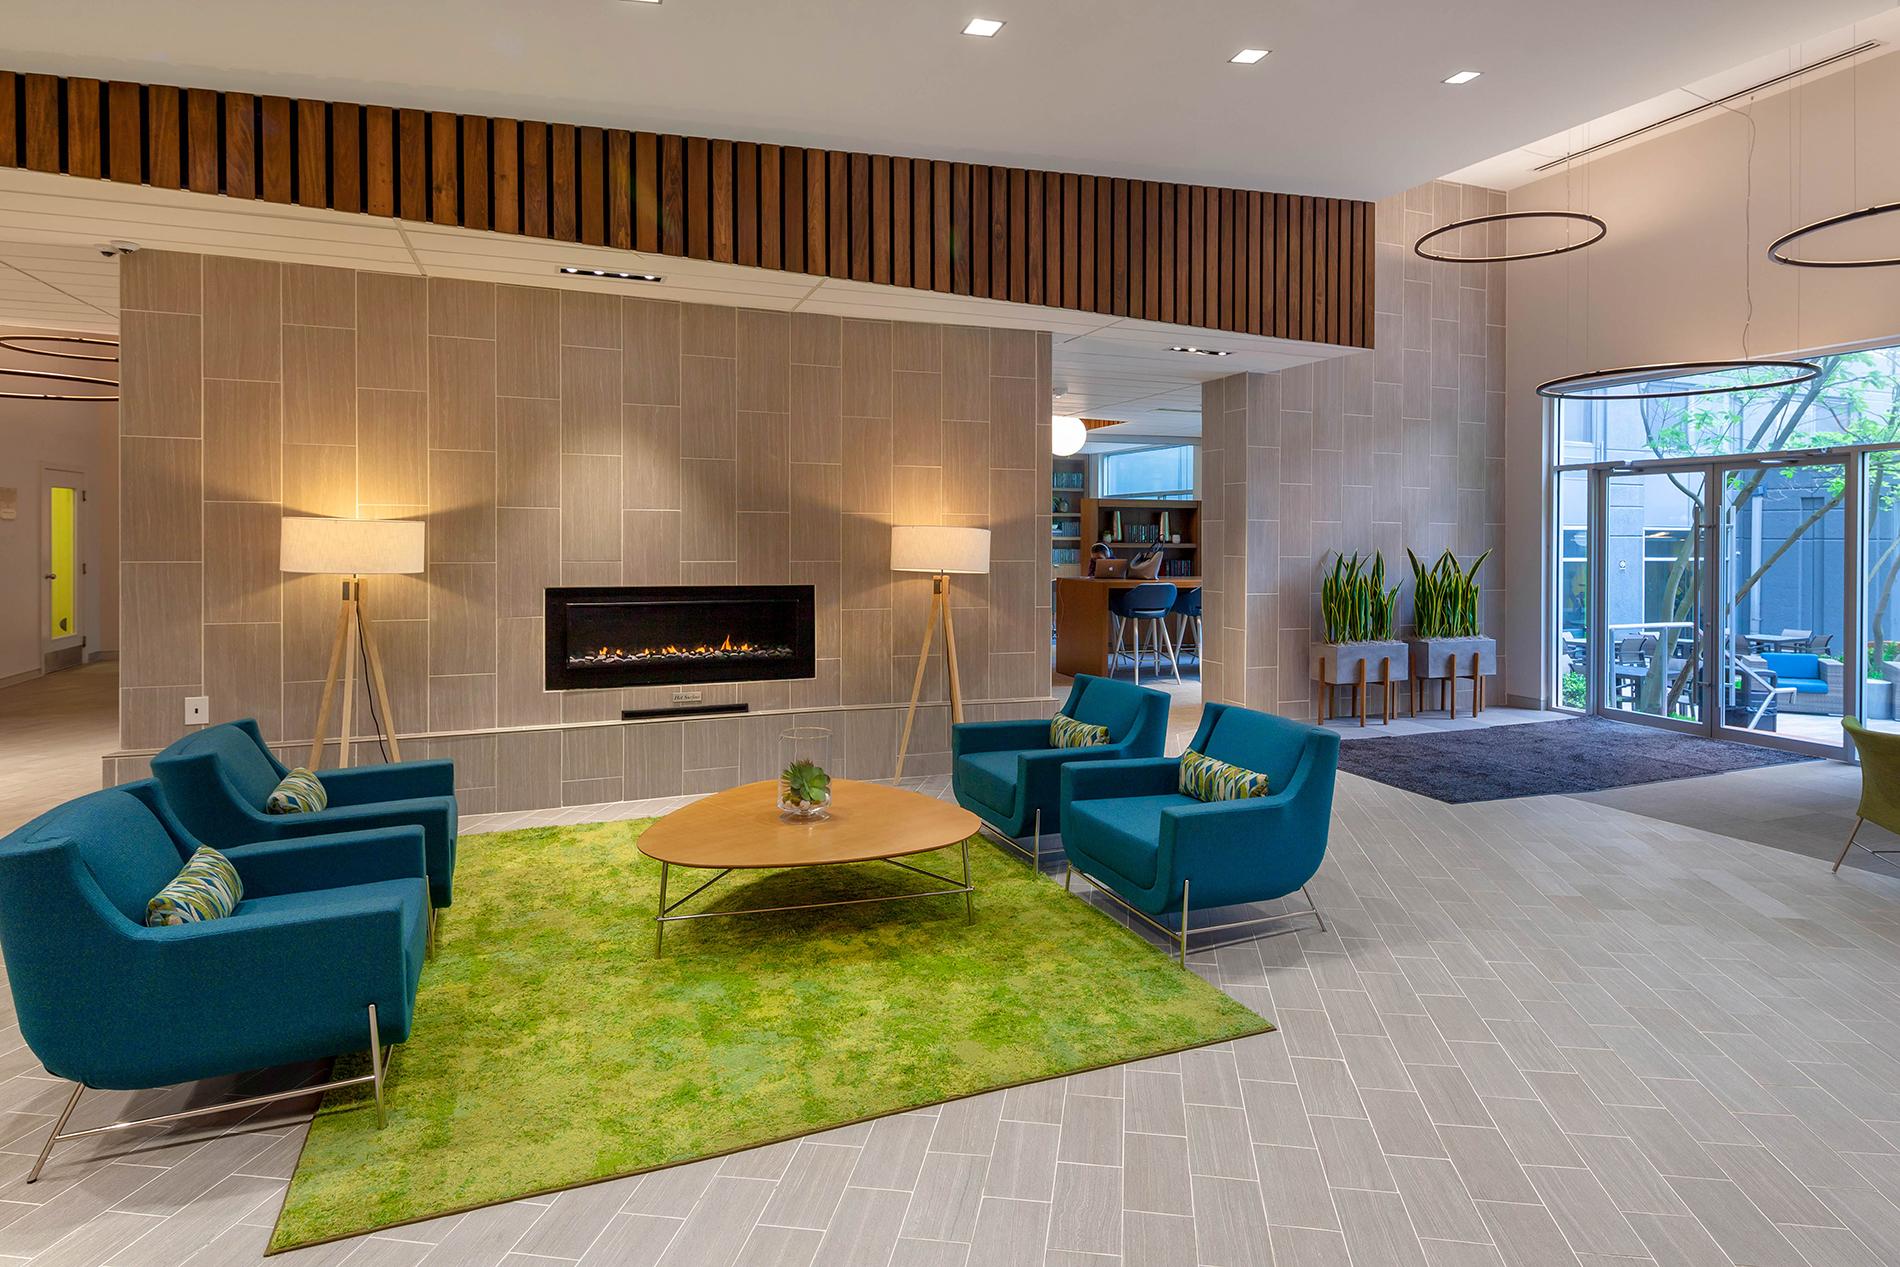 Lobby of an apartment building